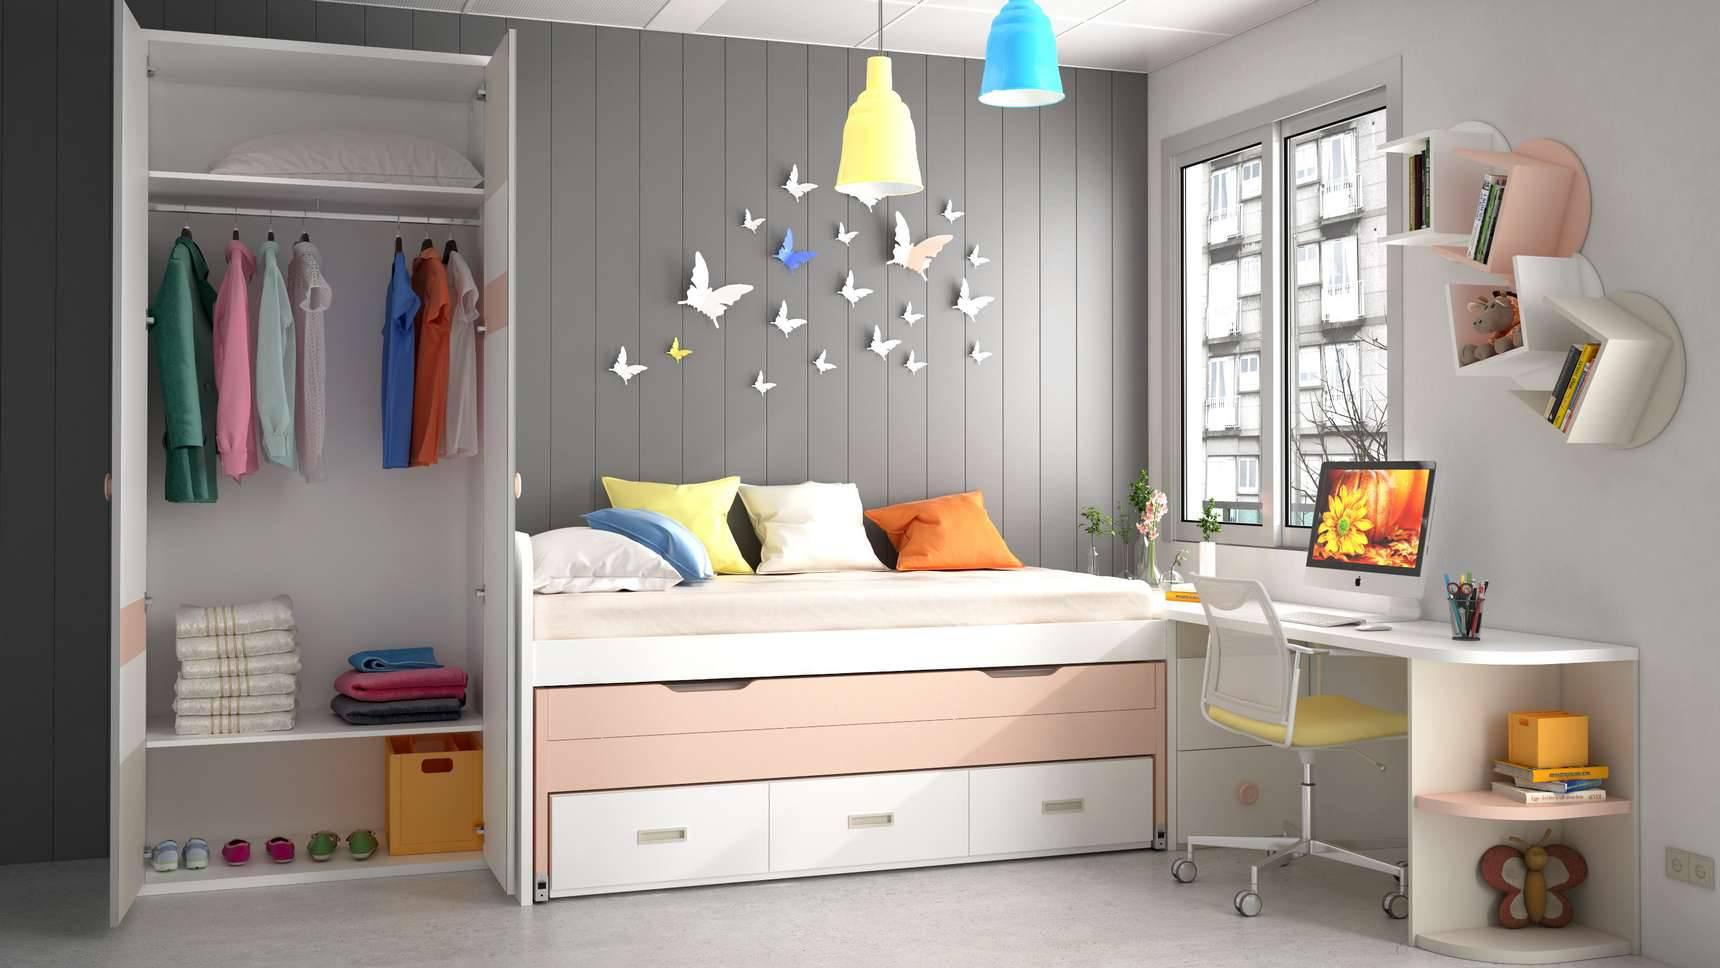 Dormitorio juvenil con cama compacta ideh bita - Cama juvenil compacta ...